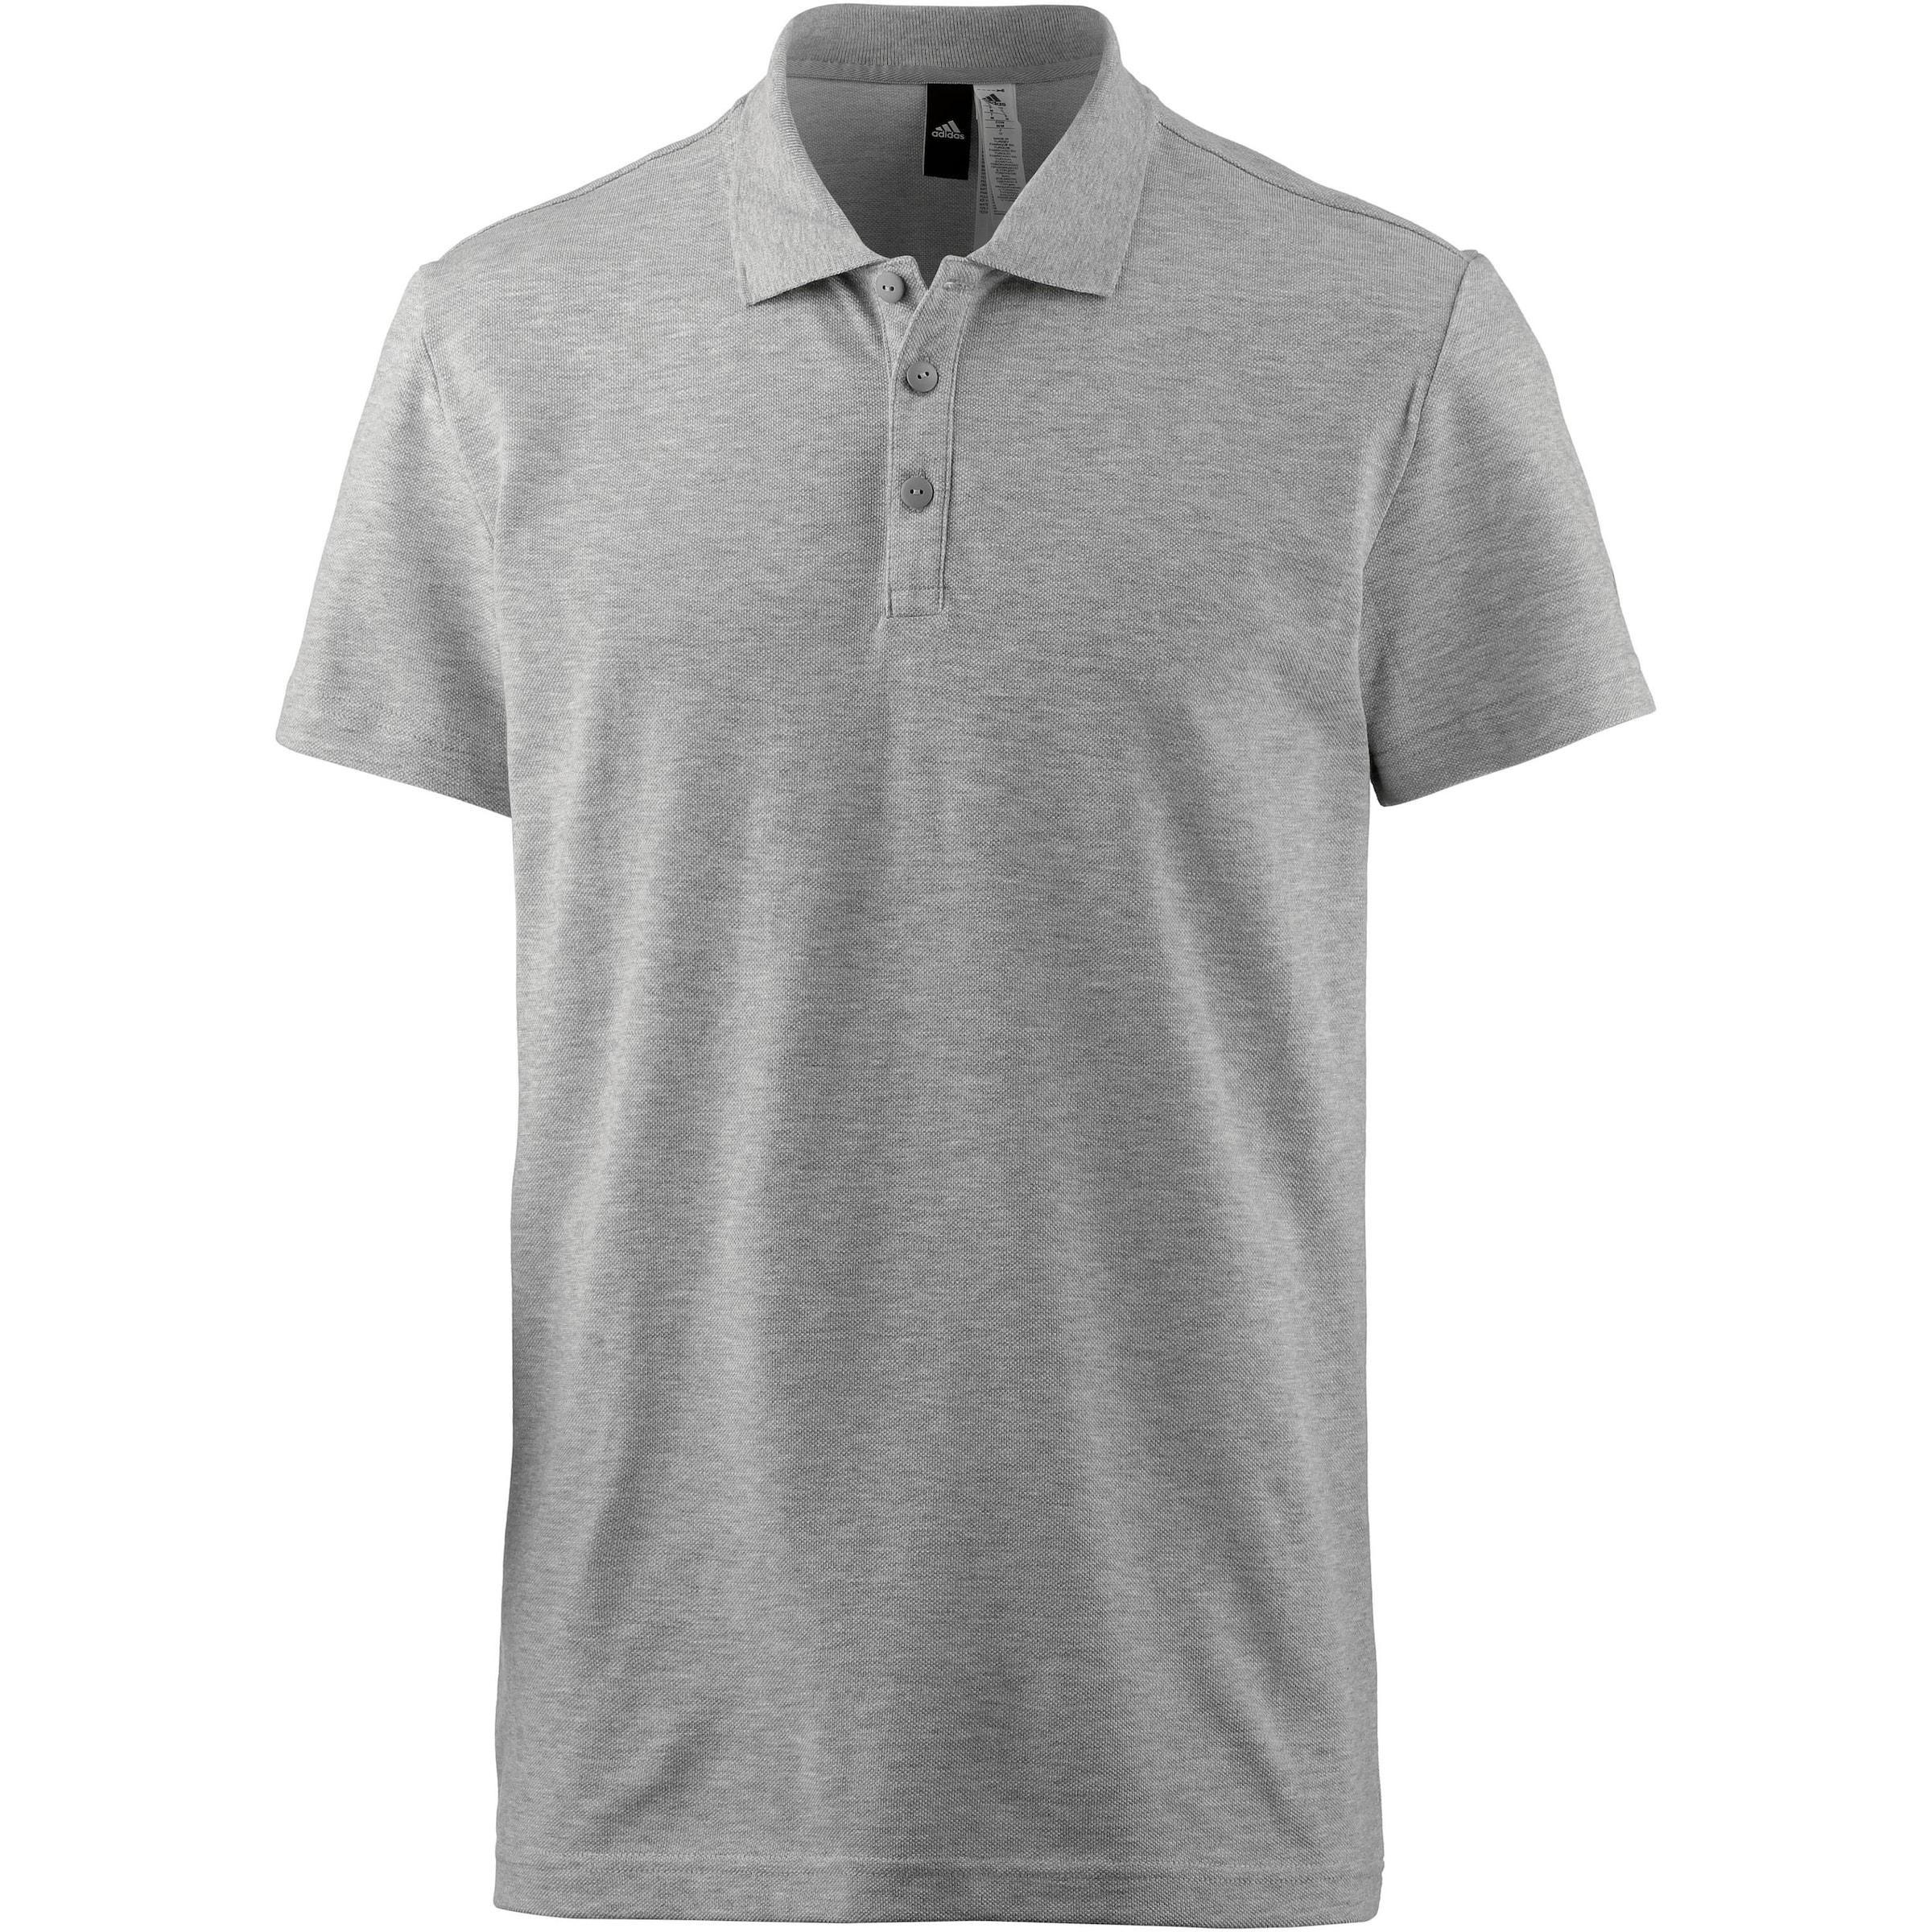 ADIDAS PERFORMANCE Poloshirt 'Essential Base' Meistverkauft Auslass Großhandelspreis Rabatt Nicekicks Spielraum Angebote Nicekicks Zum Verkauf OXqOEU